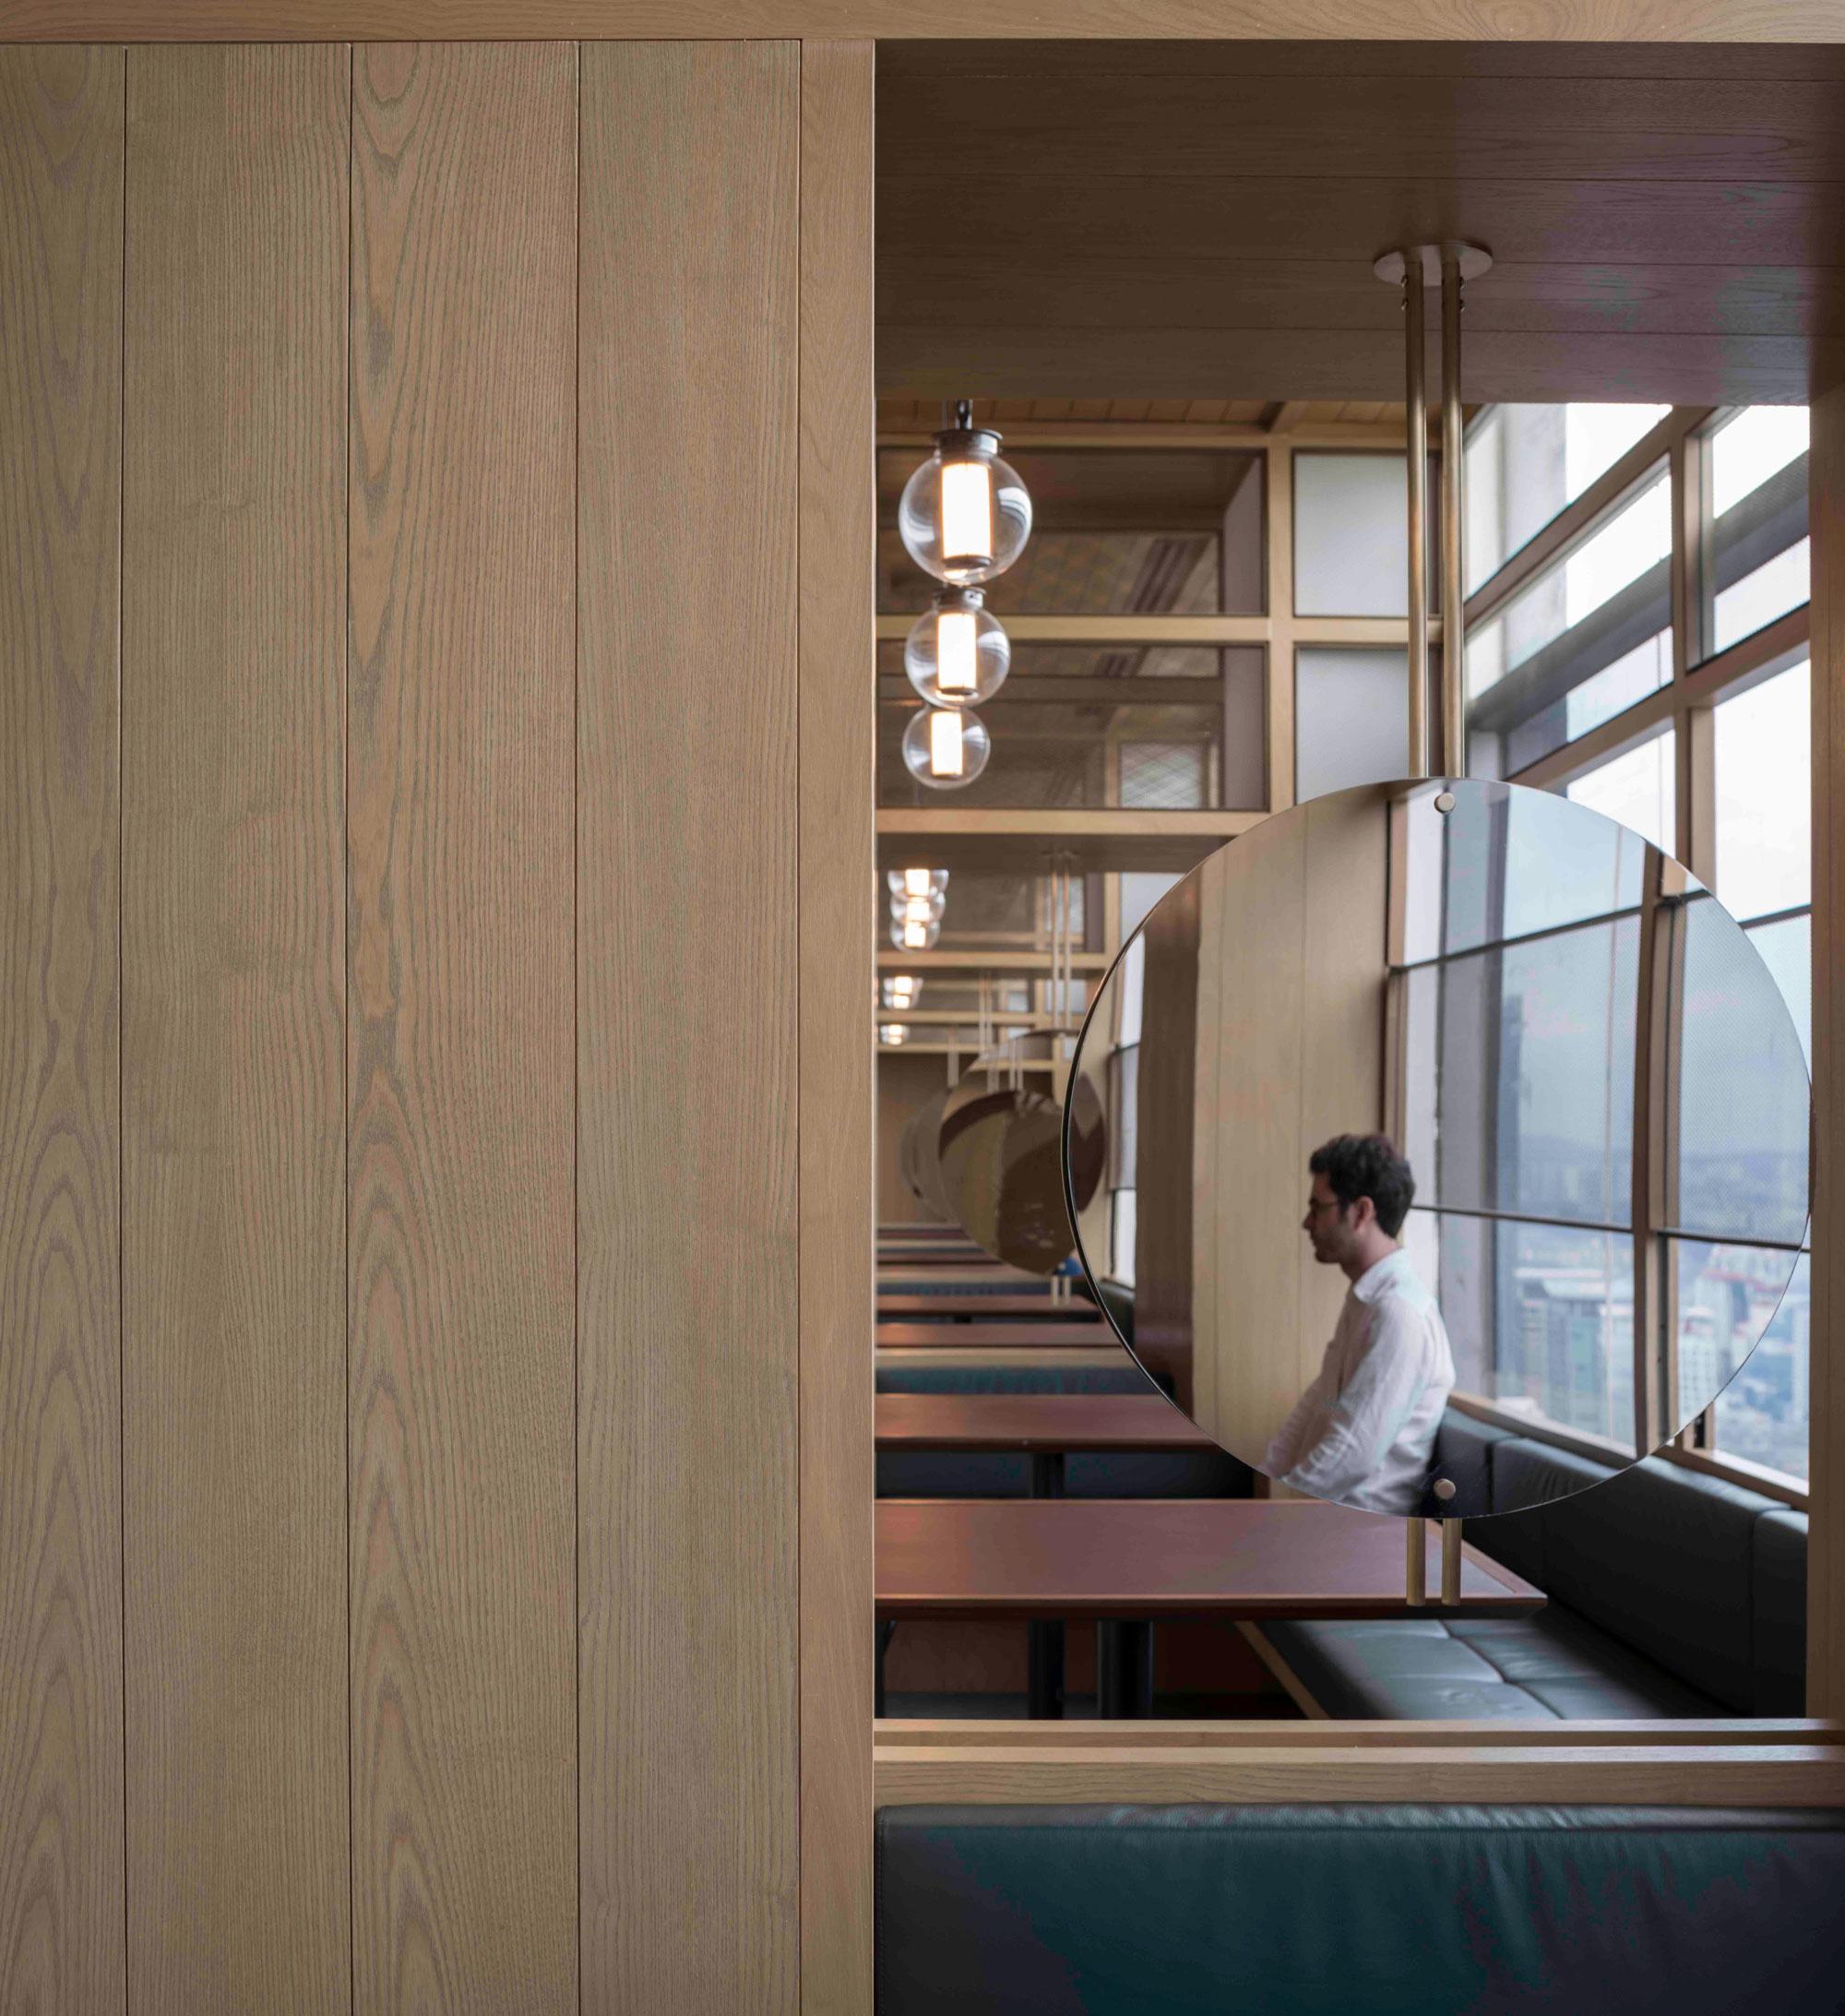 Alila Bangsar Designed by Neri&Hu Pedro Pegenaute